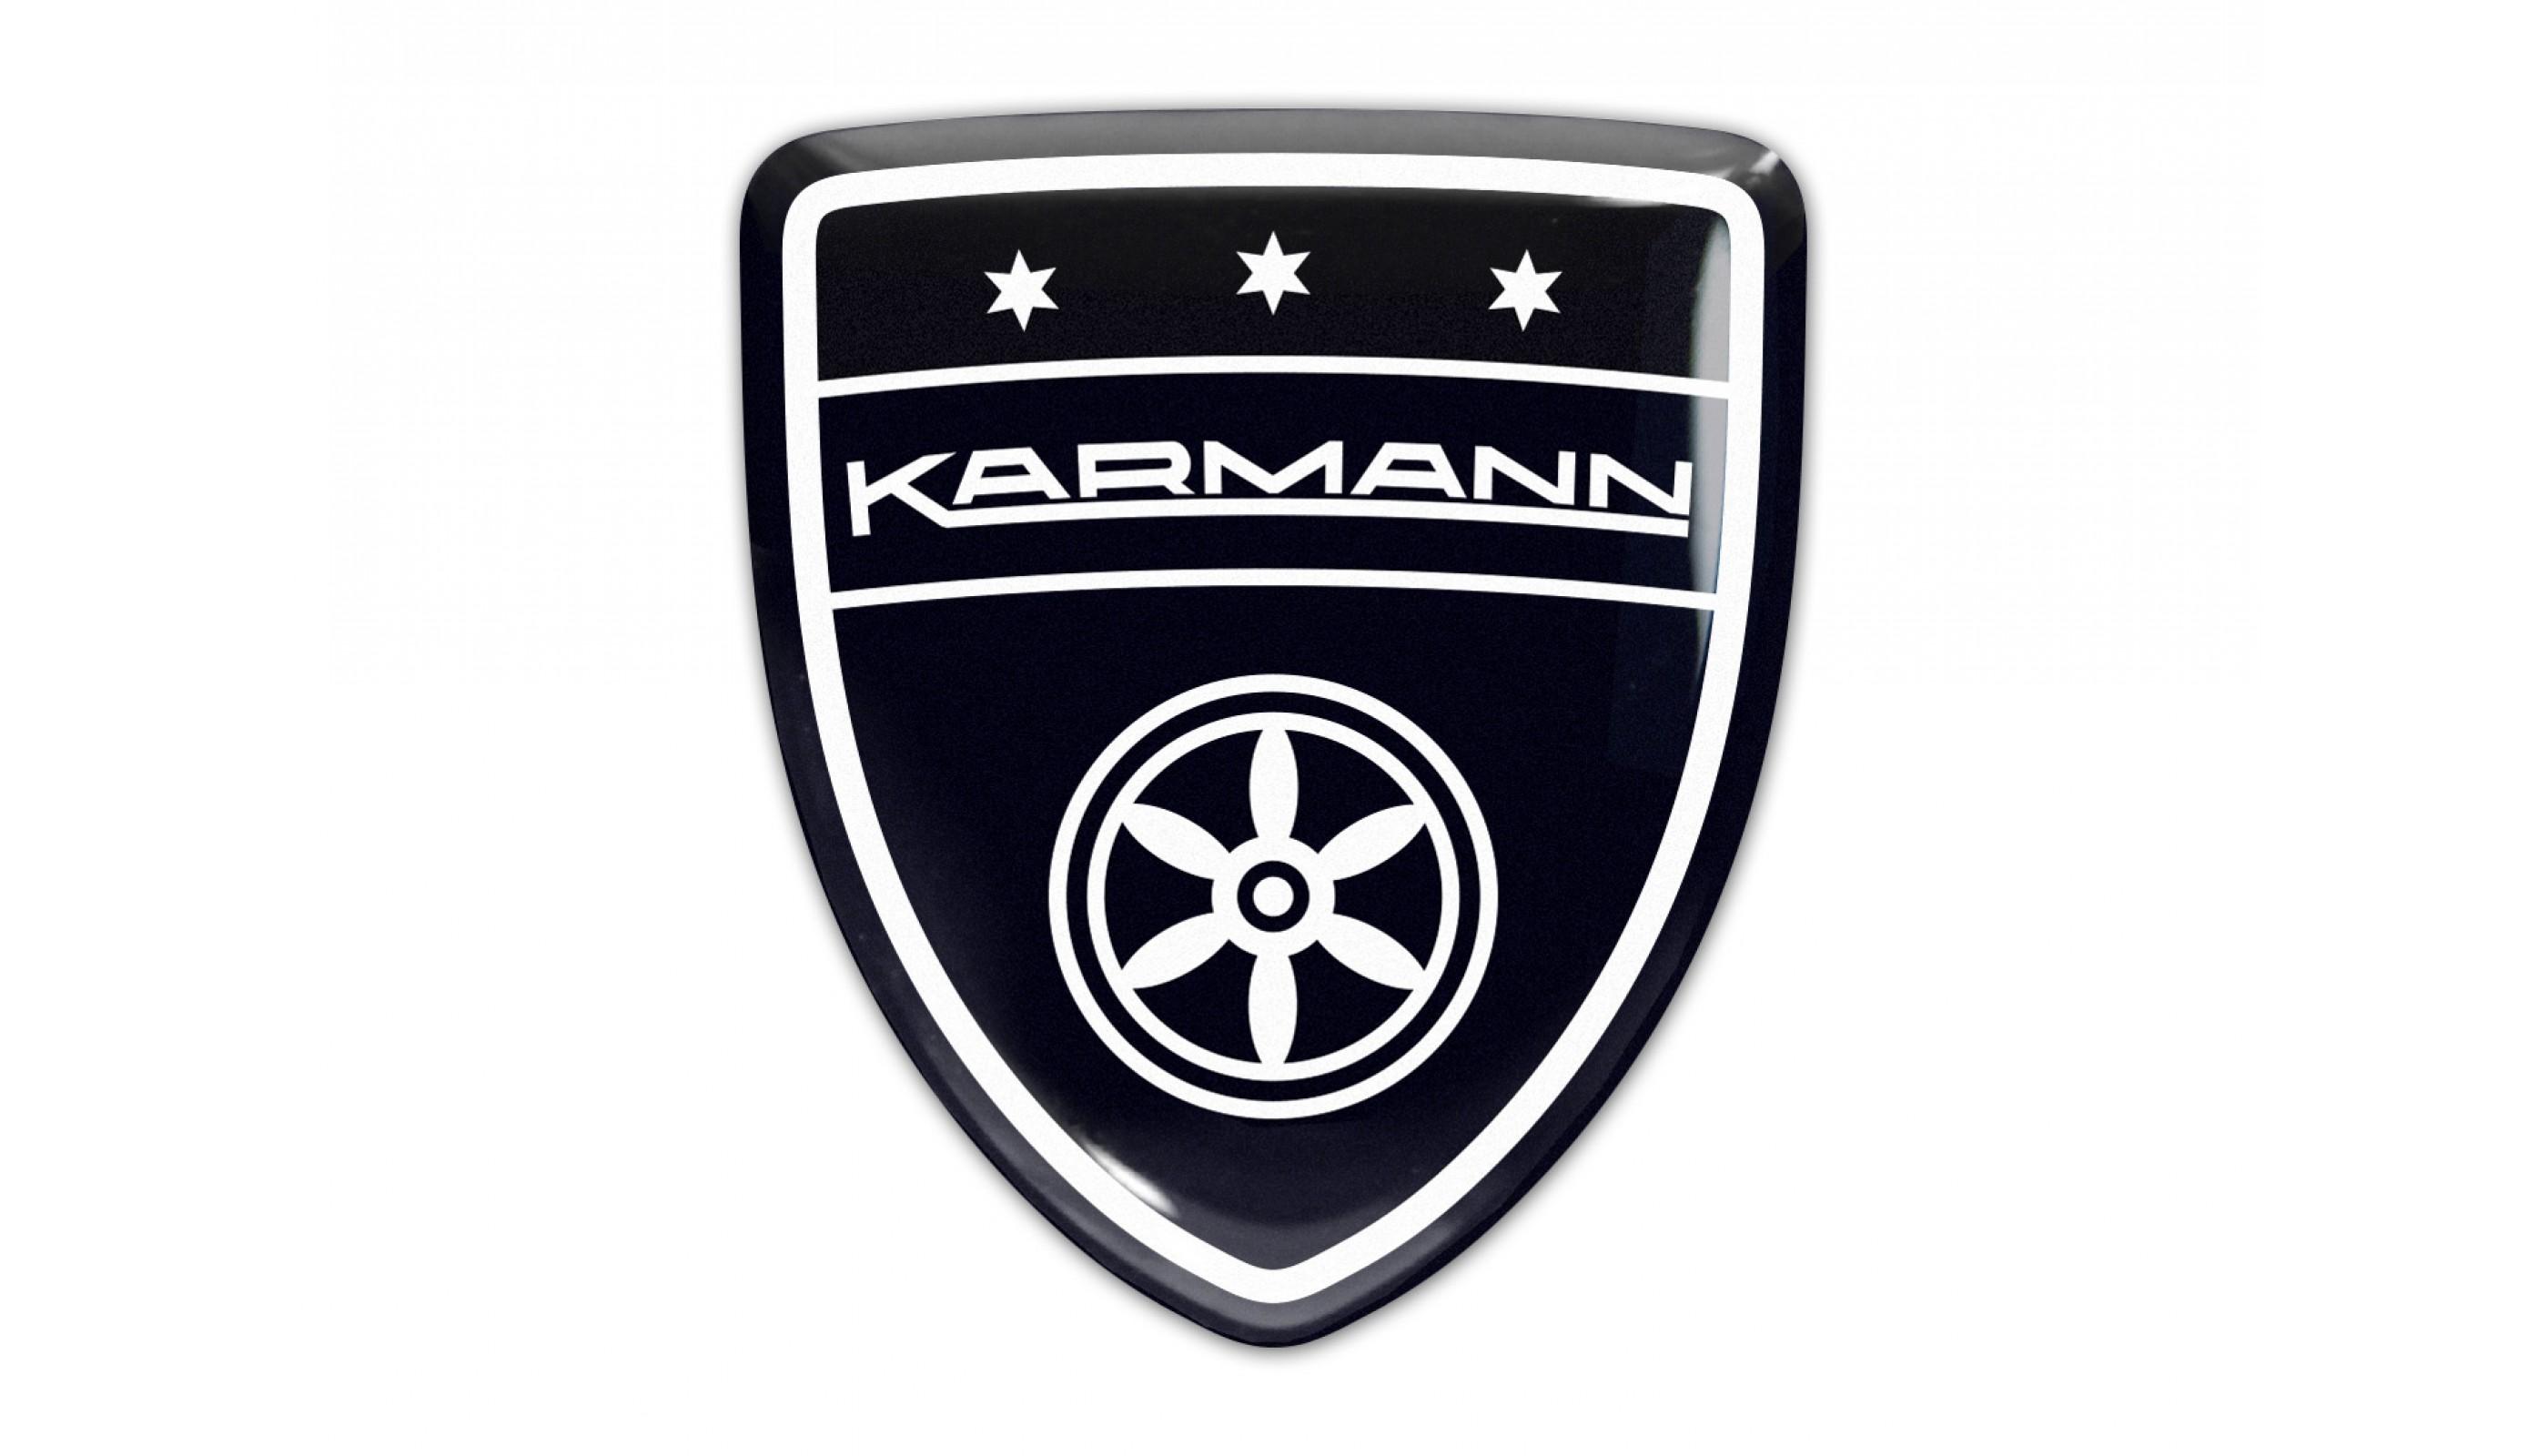 Karmann Black Domed Emblem